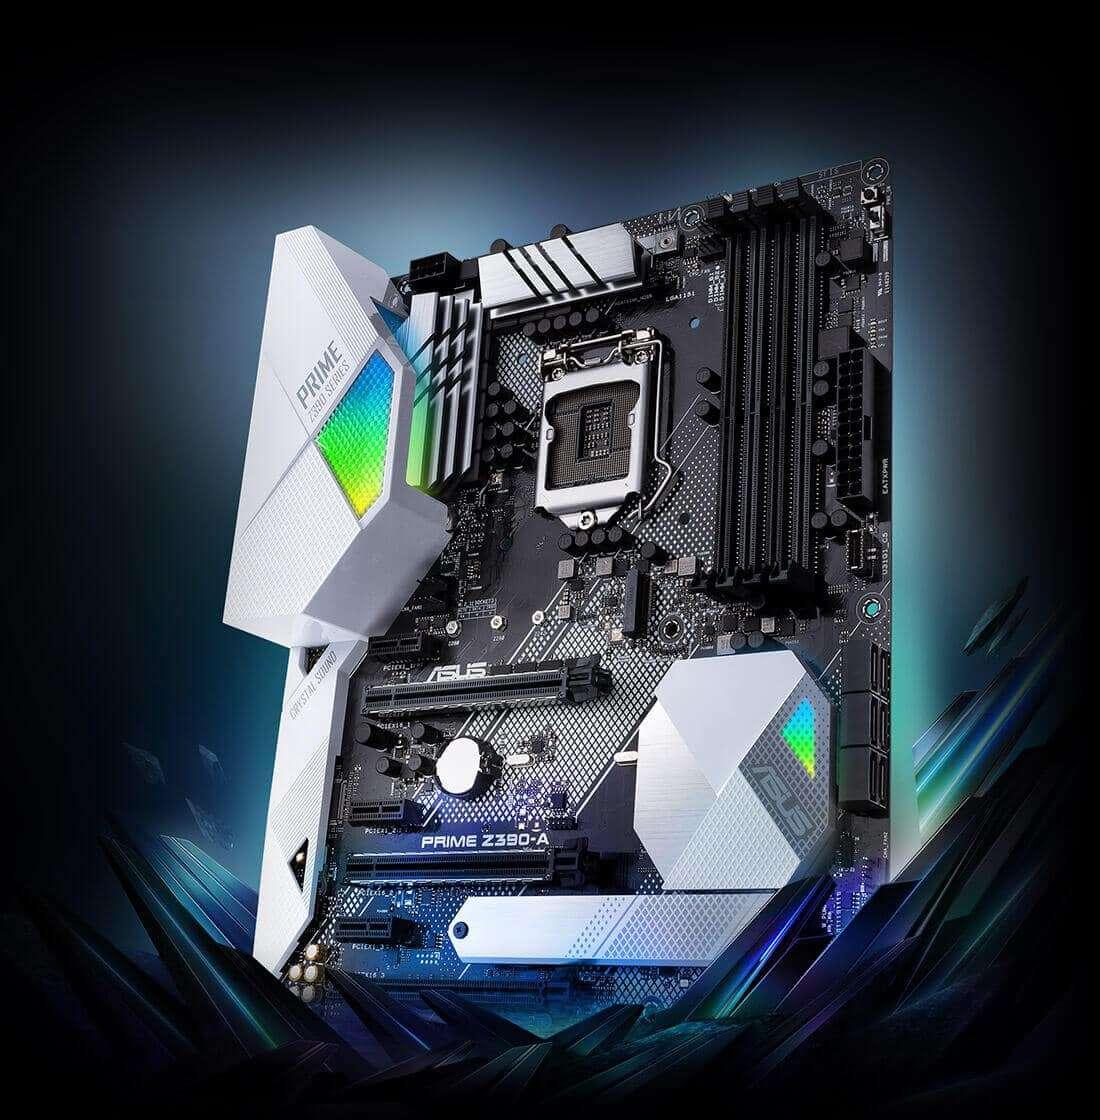 ASUS – PRIME Z390-A, Intel Z390, 1151, ATX, 4 DDR4, SLI/XFire, HDMI, DP, RGB Lighting